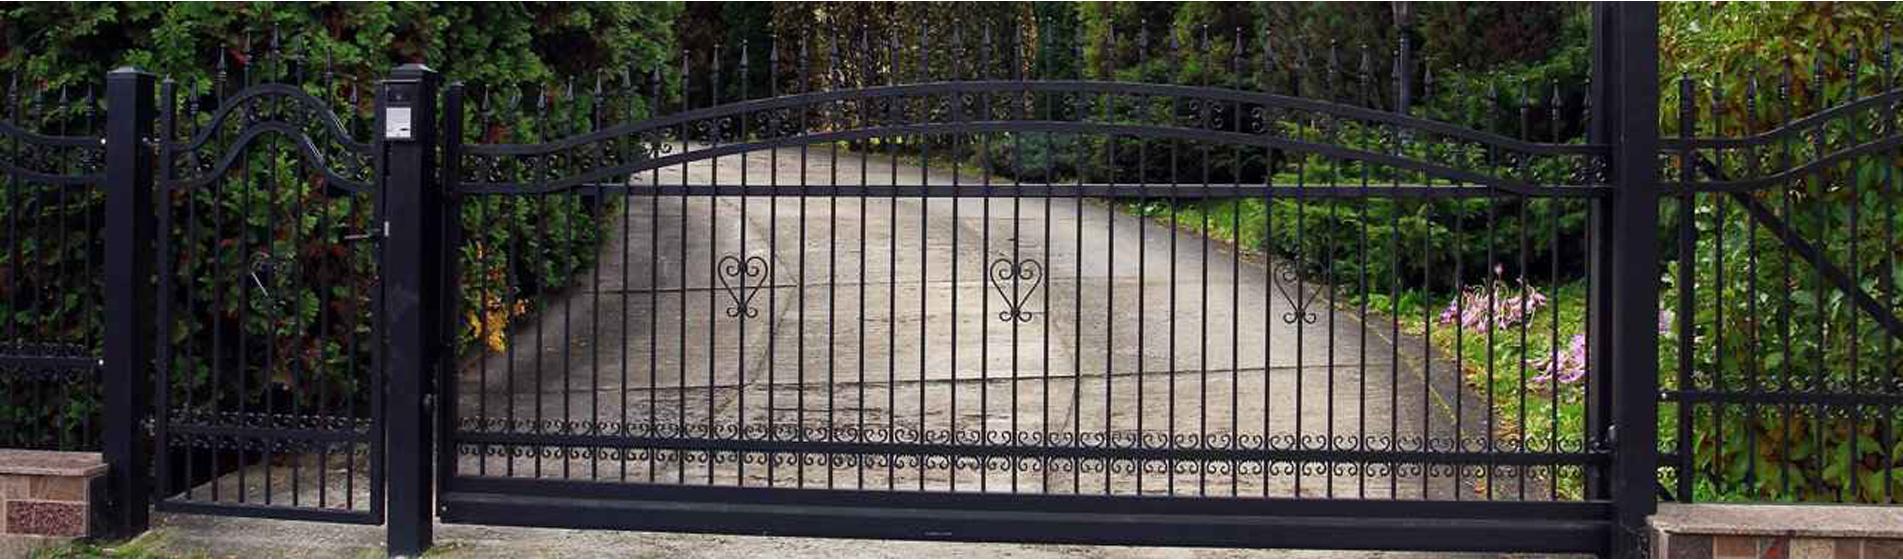 fabricant portail coulissant automatisé 30 Gard